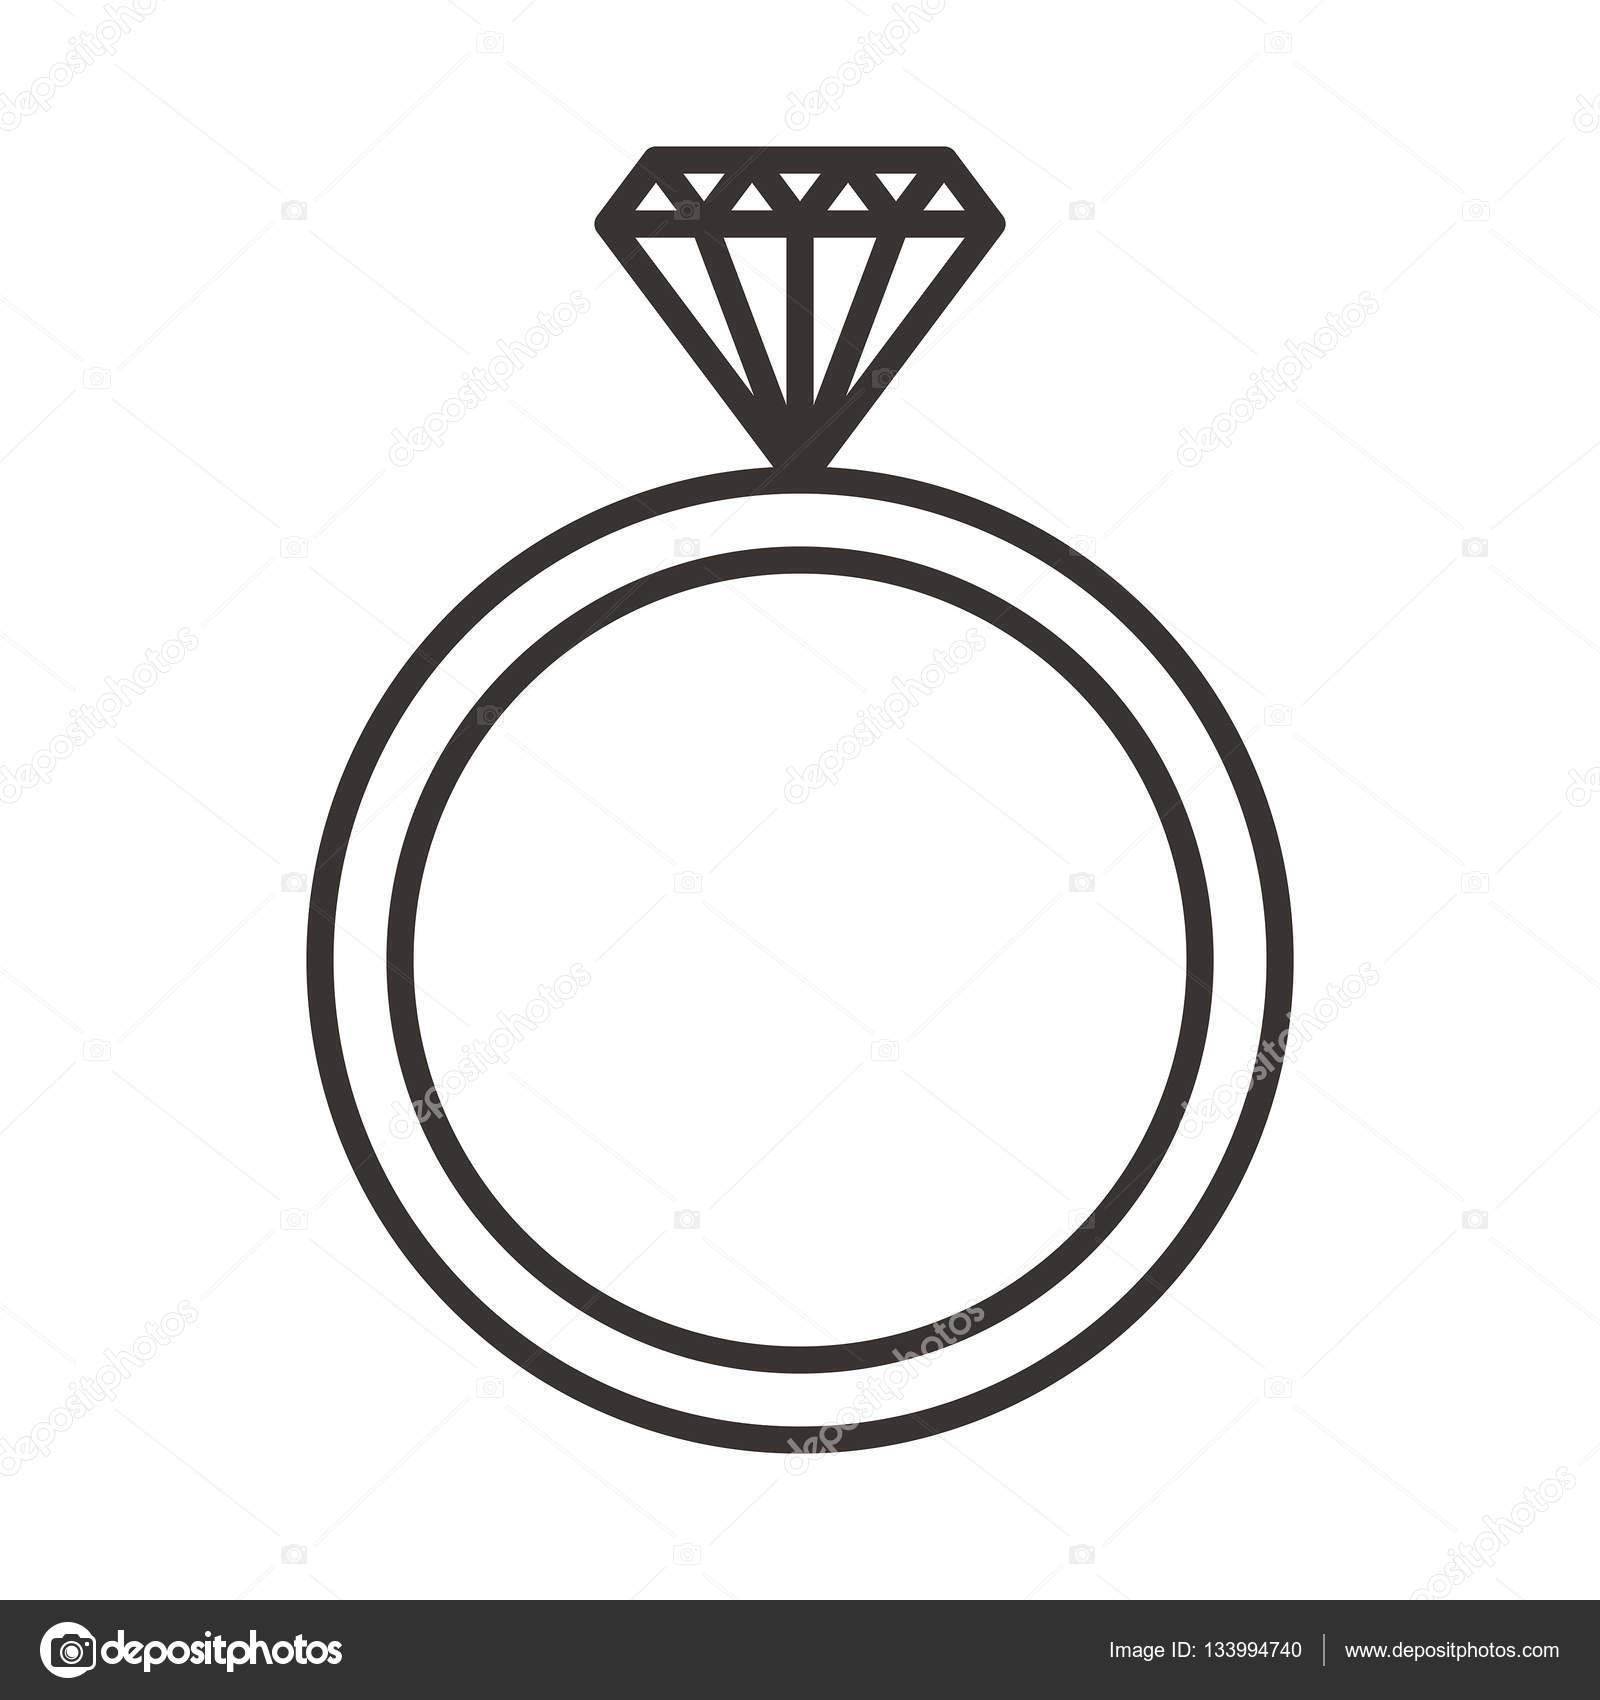 wedding ring icon — Stock Vector © everydaytemplate #133994740